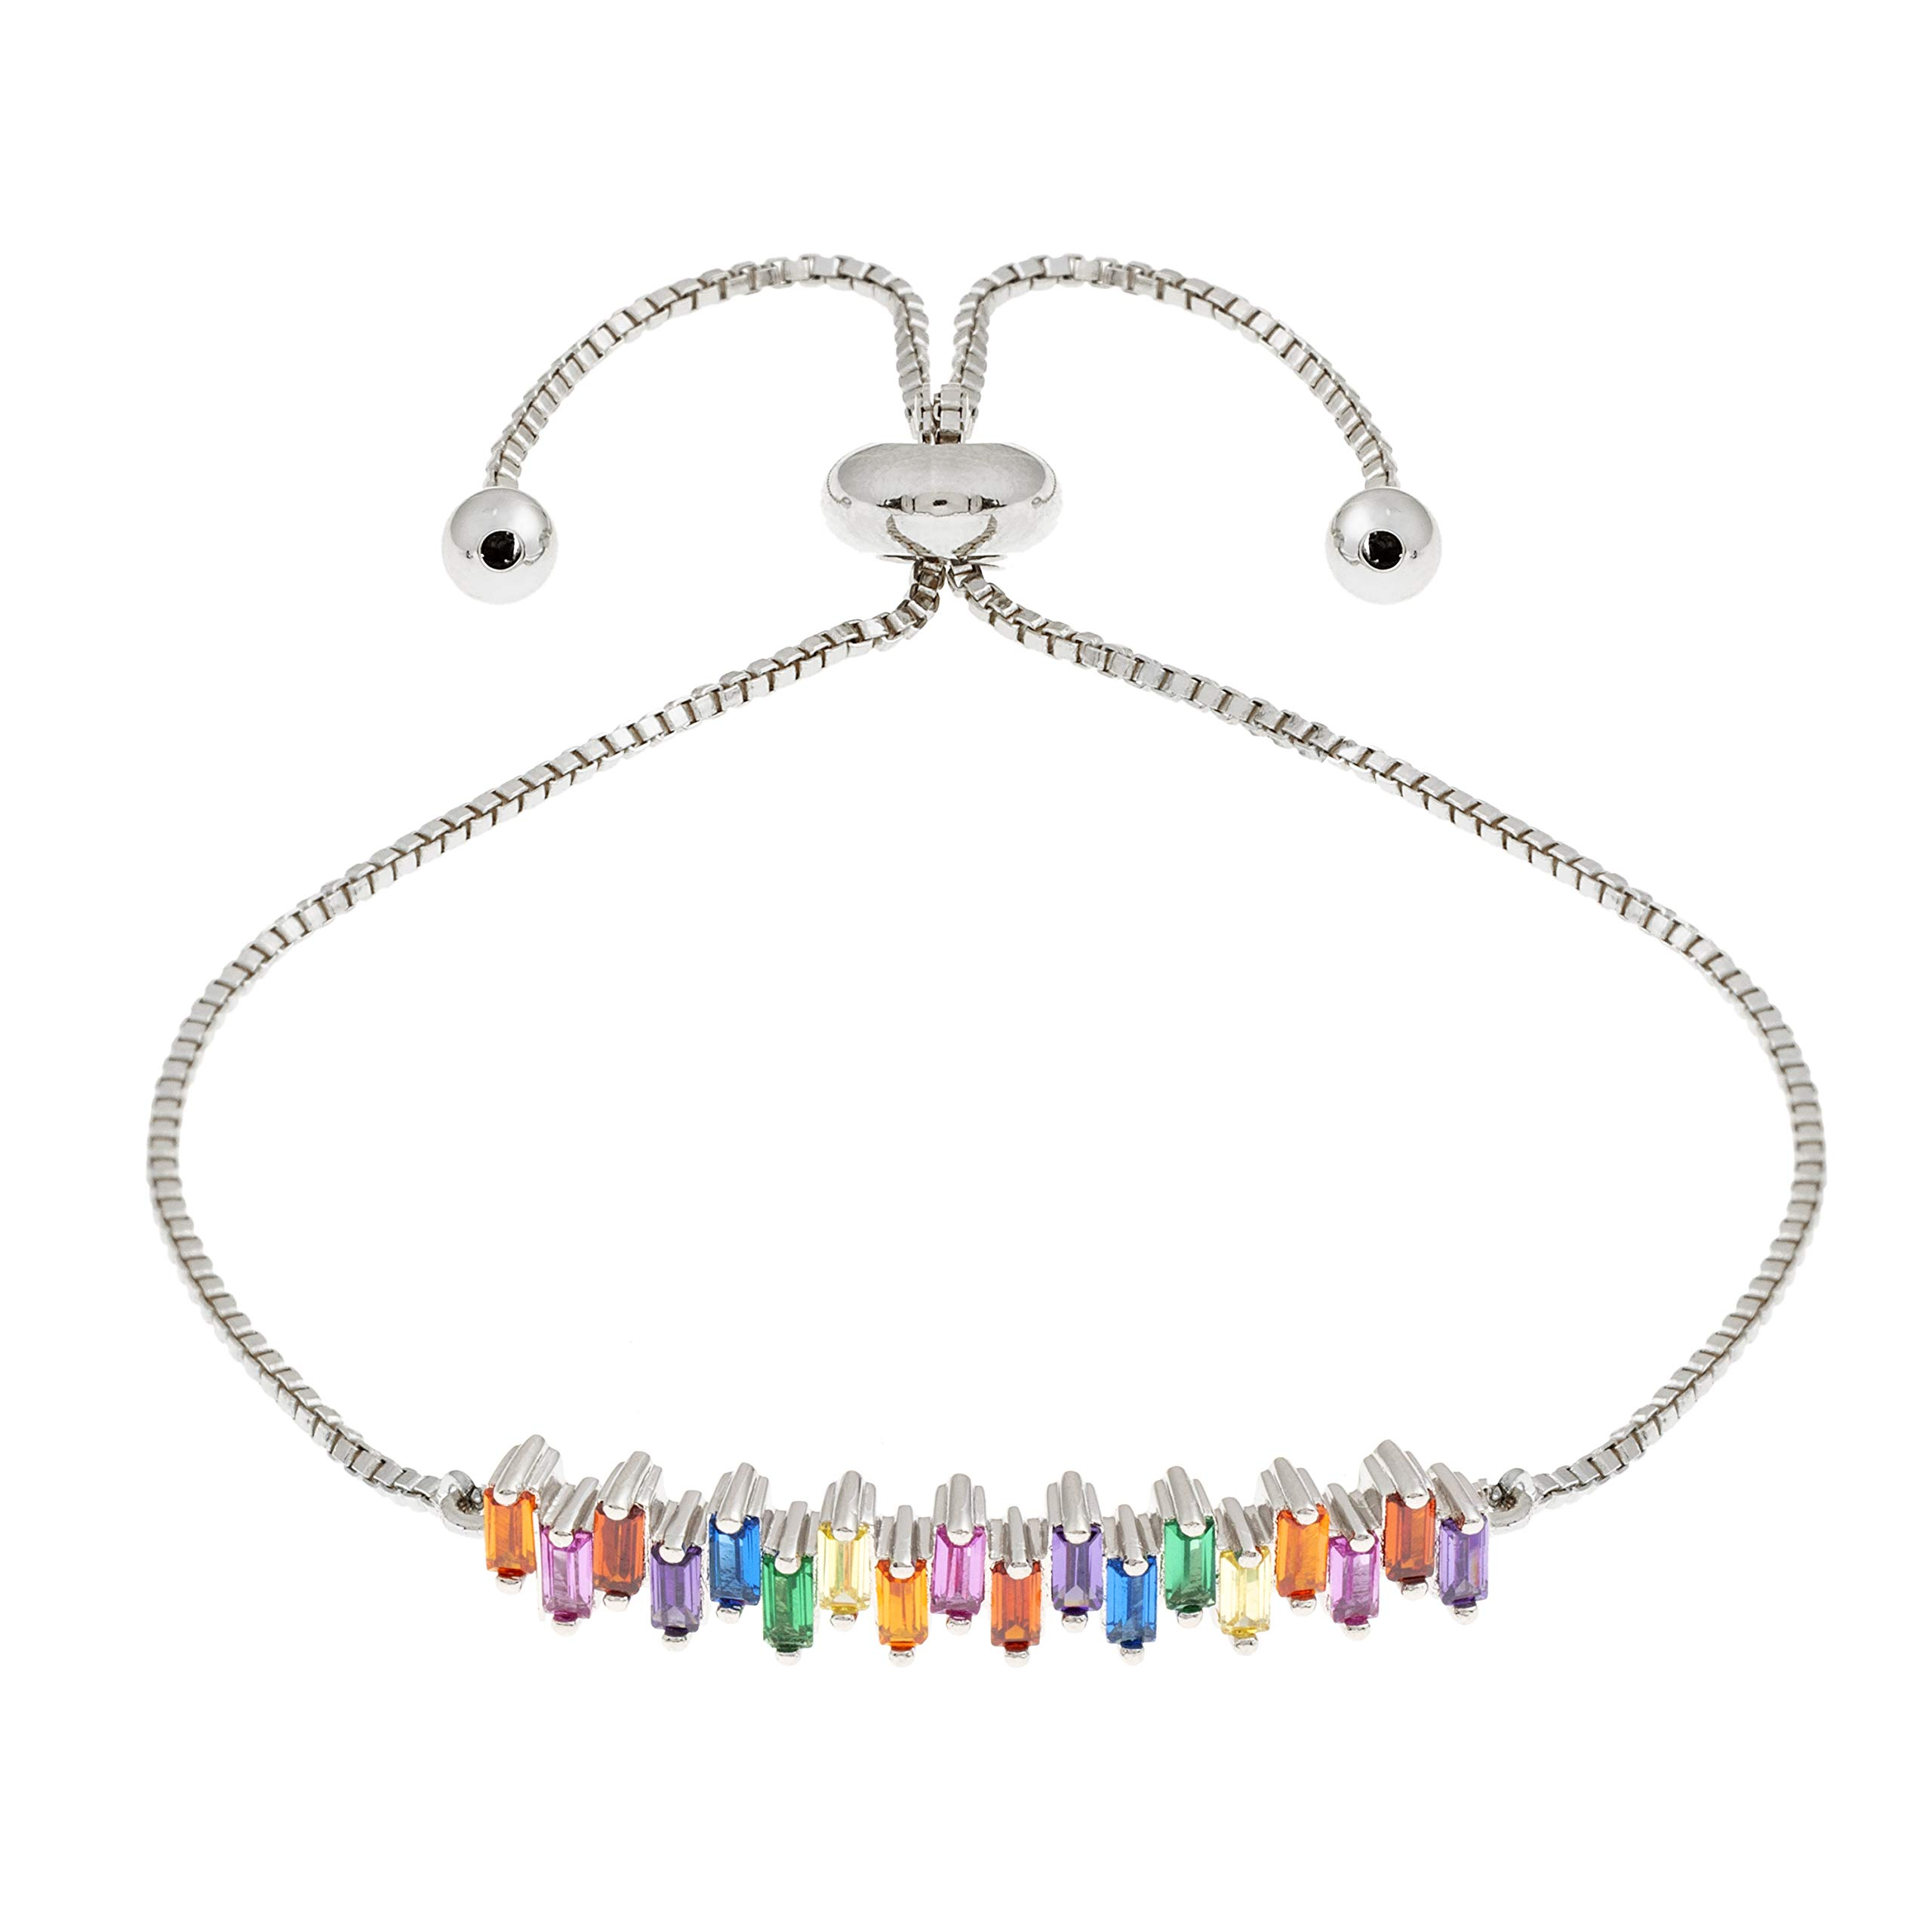 ELEGANT CONFETTI Women's 18K White Gold Plated CZ Simulated Baguette Diamond Rainbow Adjustable Bolo Bracelet